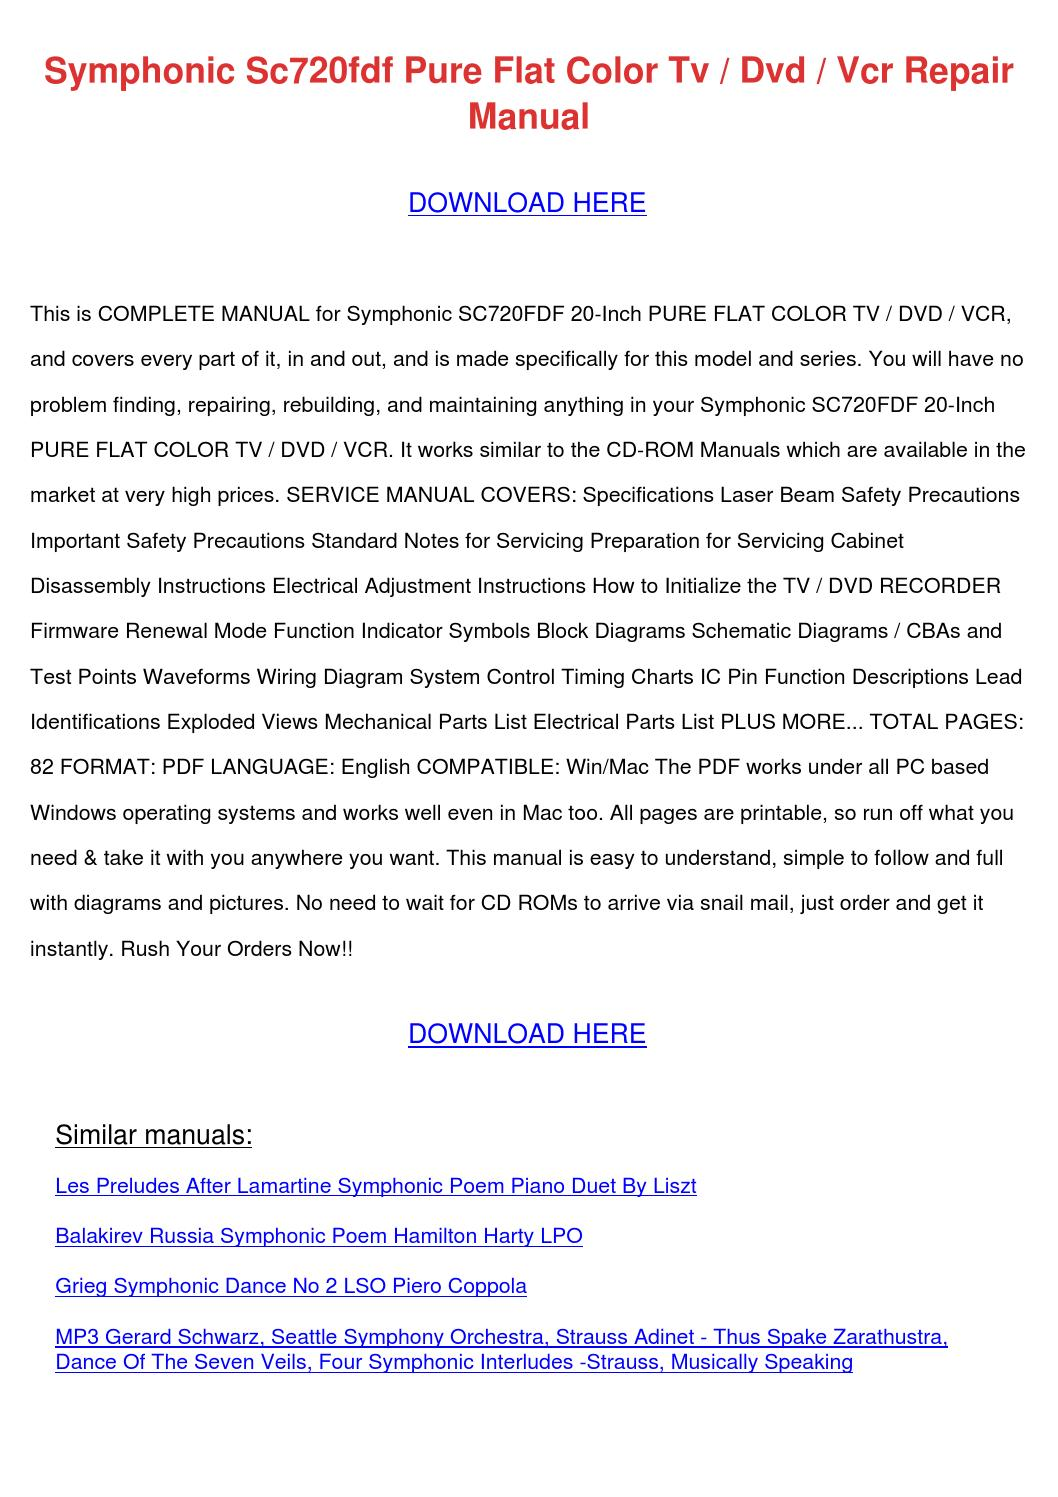 Symphonic Sc720fdf Pure Flat Color Tv Dvd Vcr By